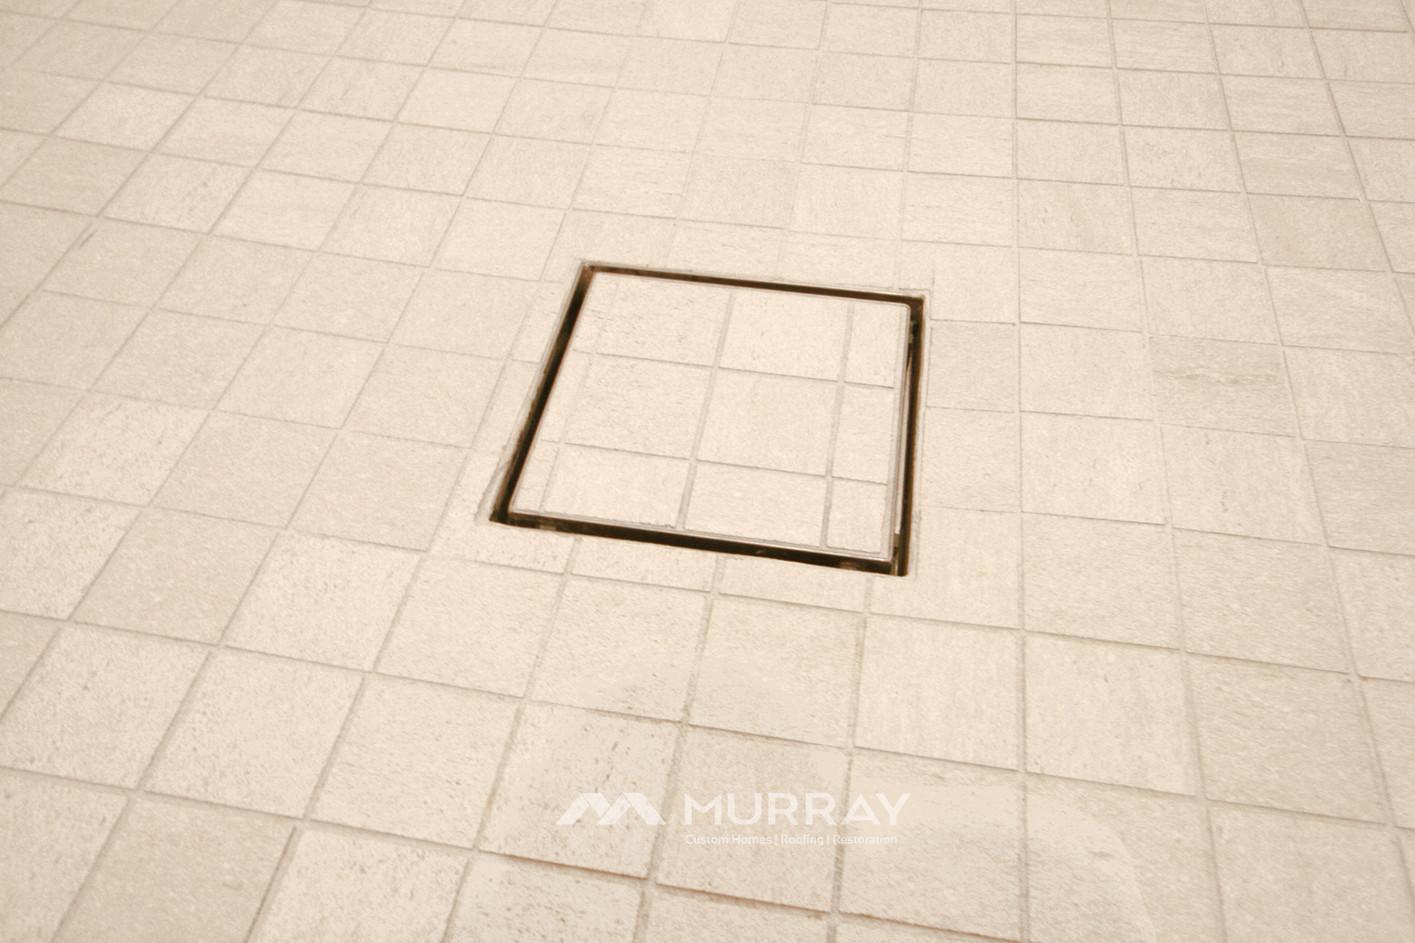 Murray Custom Home Builders Gallery SW Village Heights 6525 Master Shower Drain